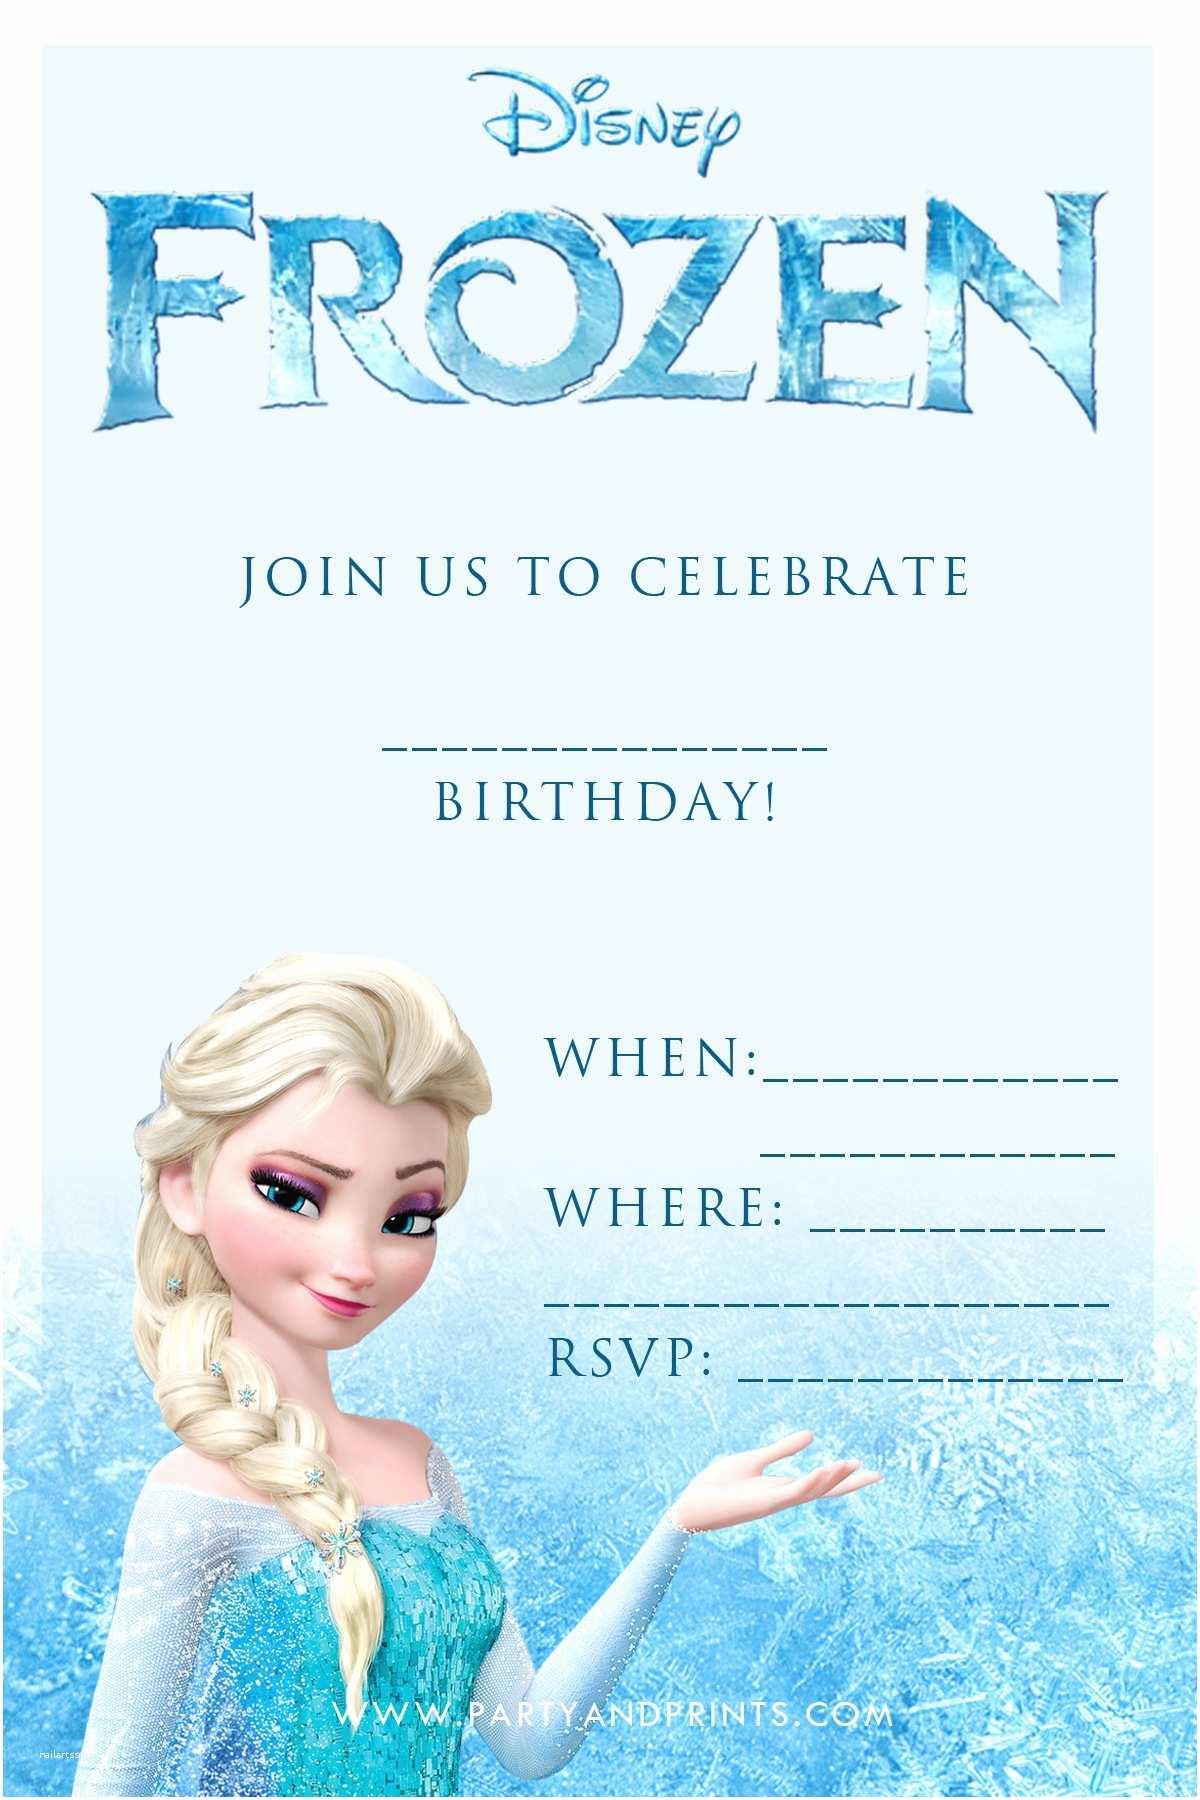 Walgreens Birthday Invitations The Invites Free Templates